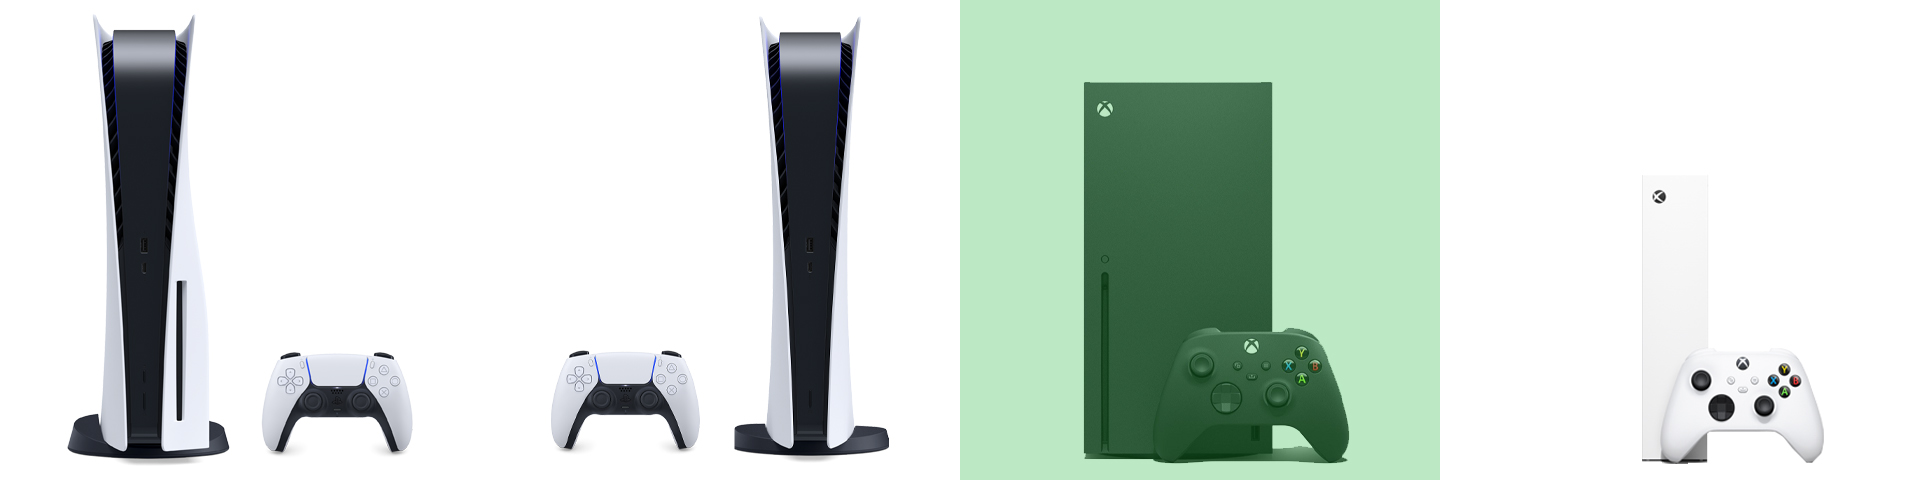 Comparatif PS5 / Xbox Next-Gen